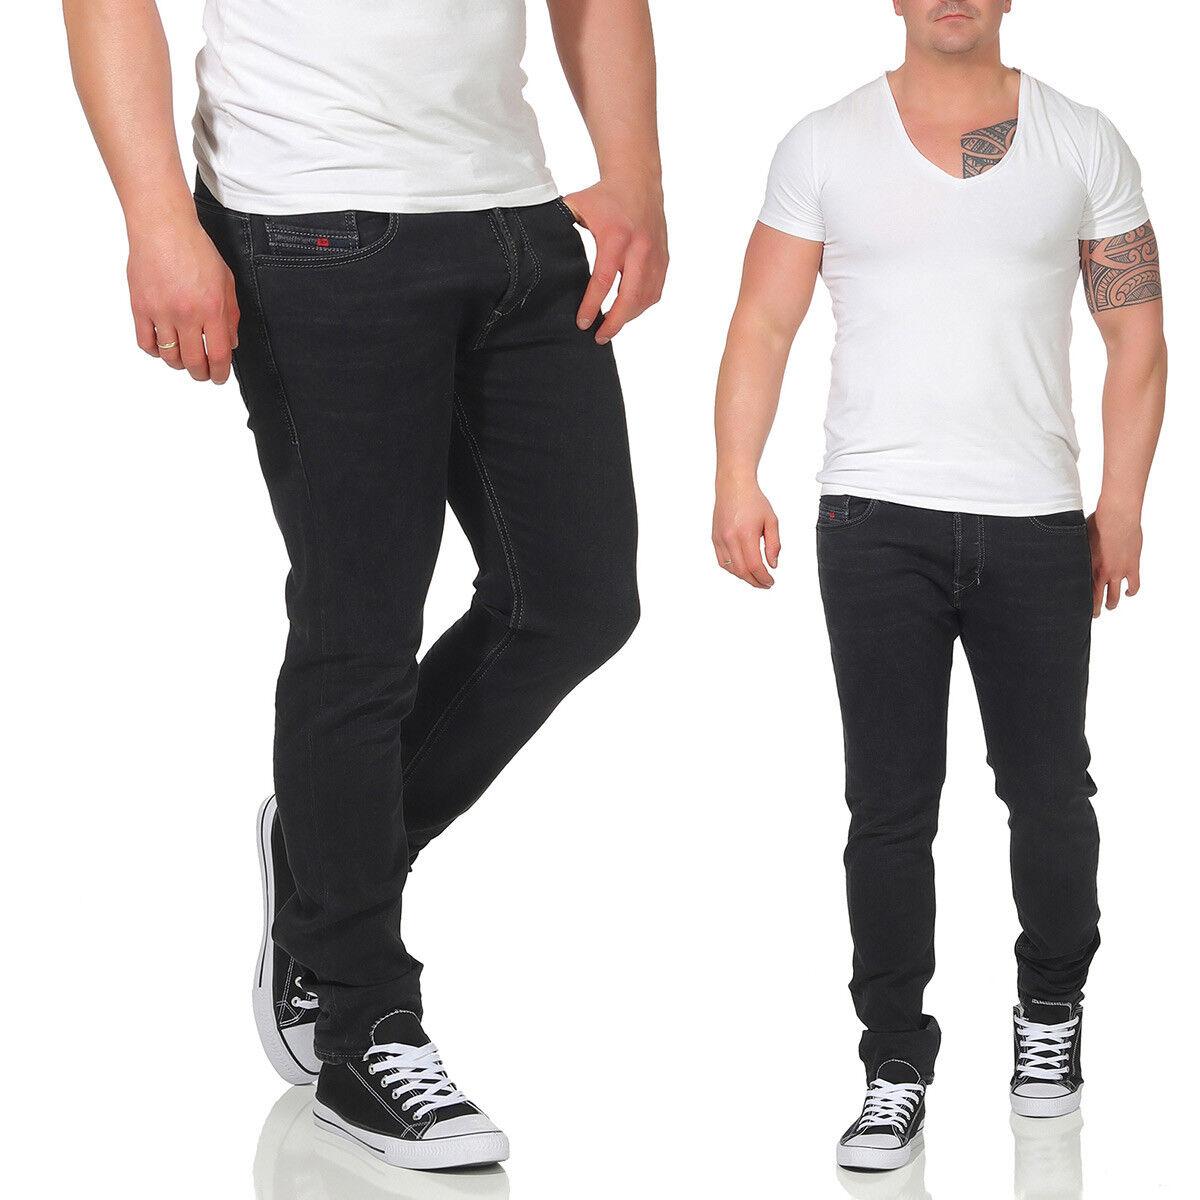 JEANS DIESEL TEPPHAR UOMO STRETCH PANTALONI SLIM Carrot Skinny Jeans Grigio Antracite